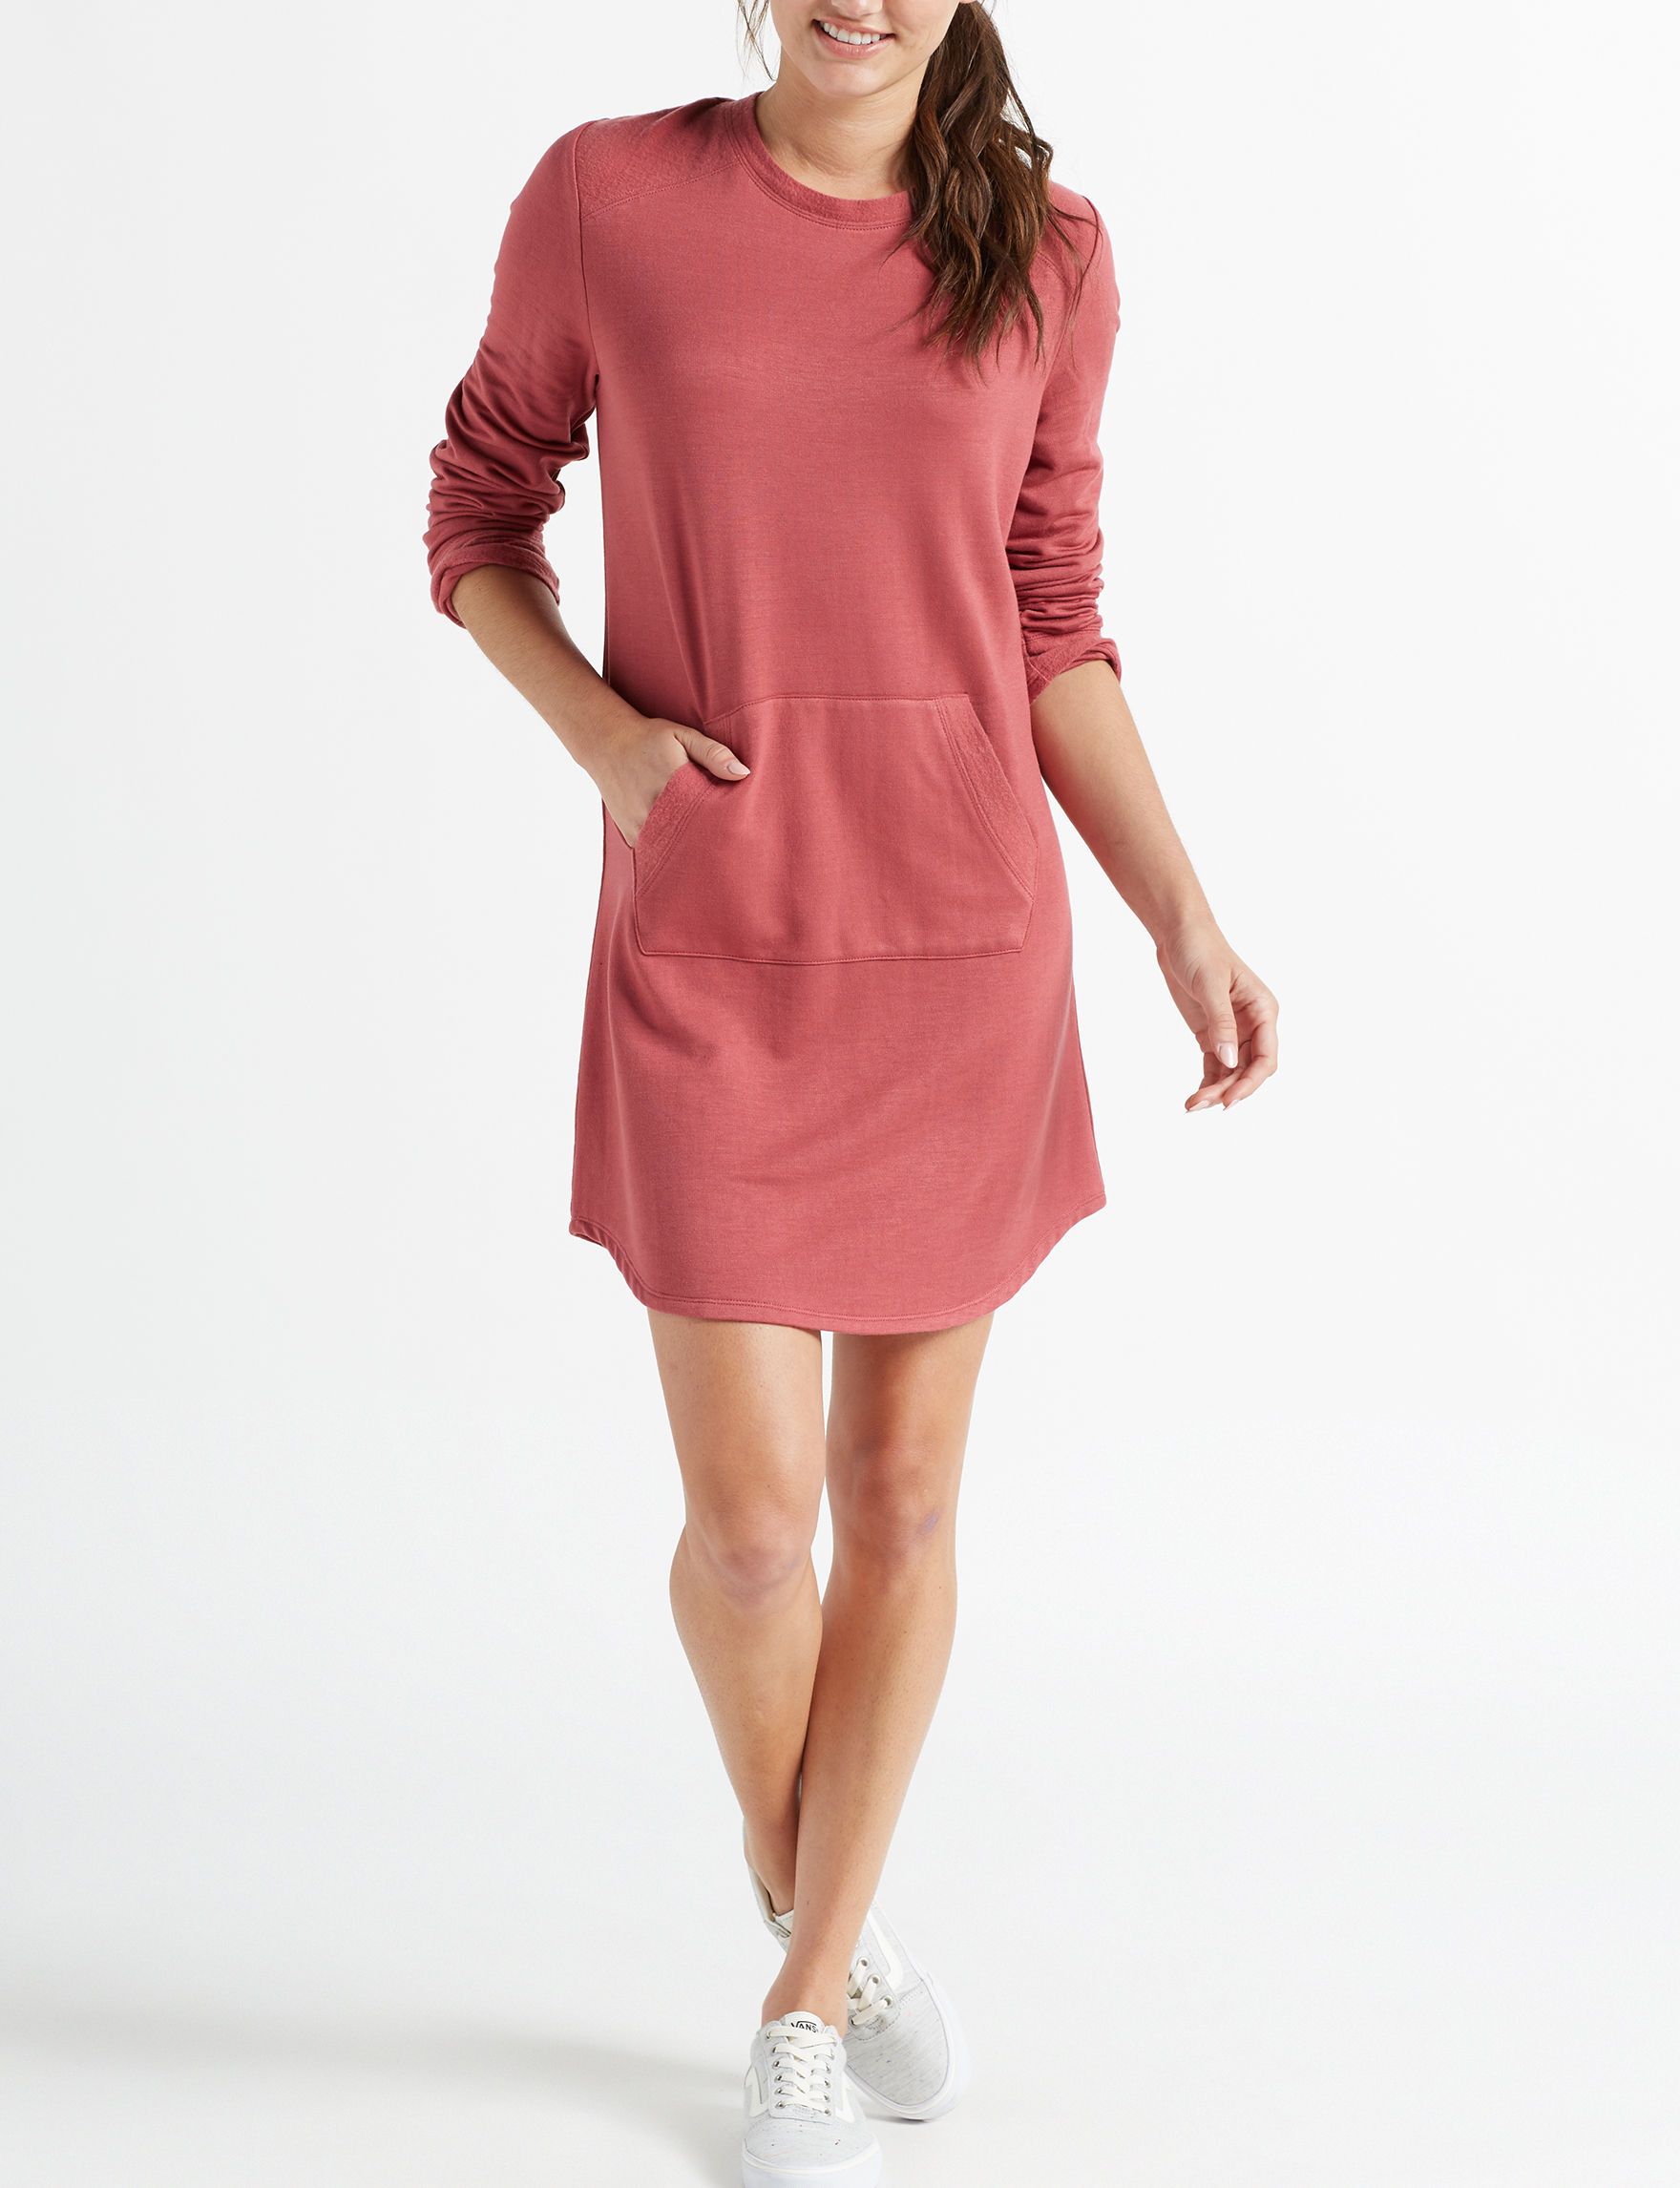 BeBop Red Everyday & Casual Shirt Dresses